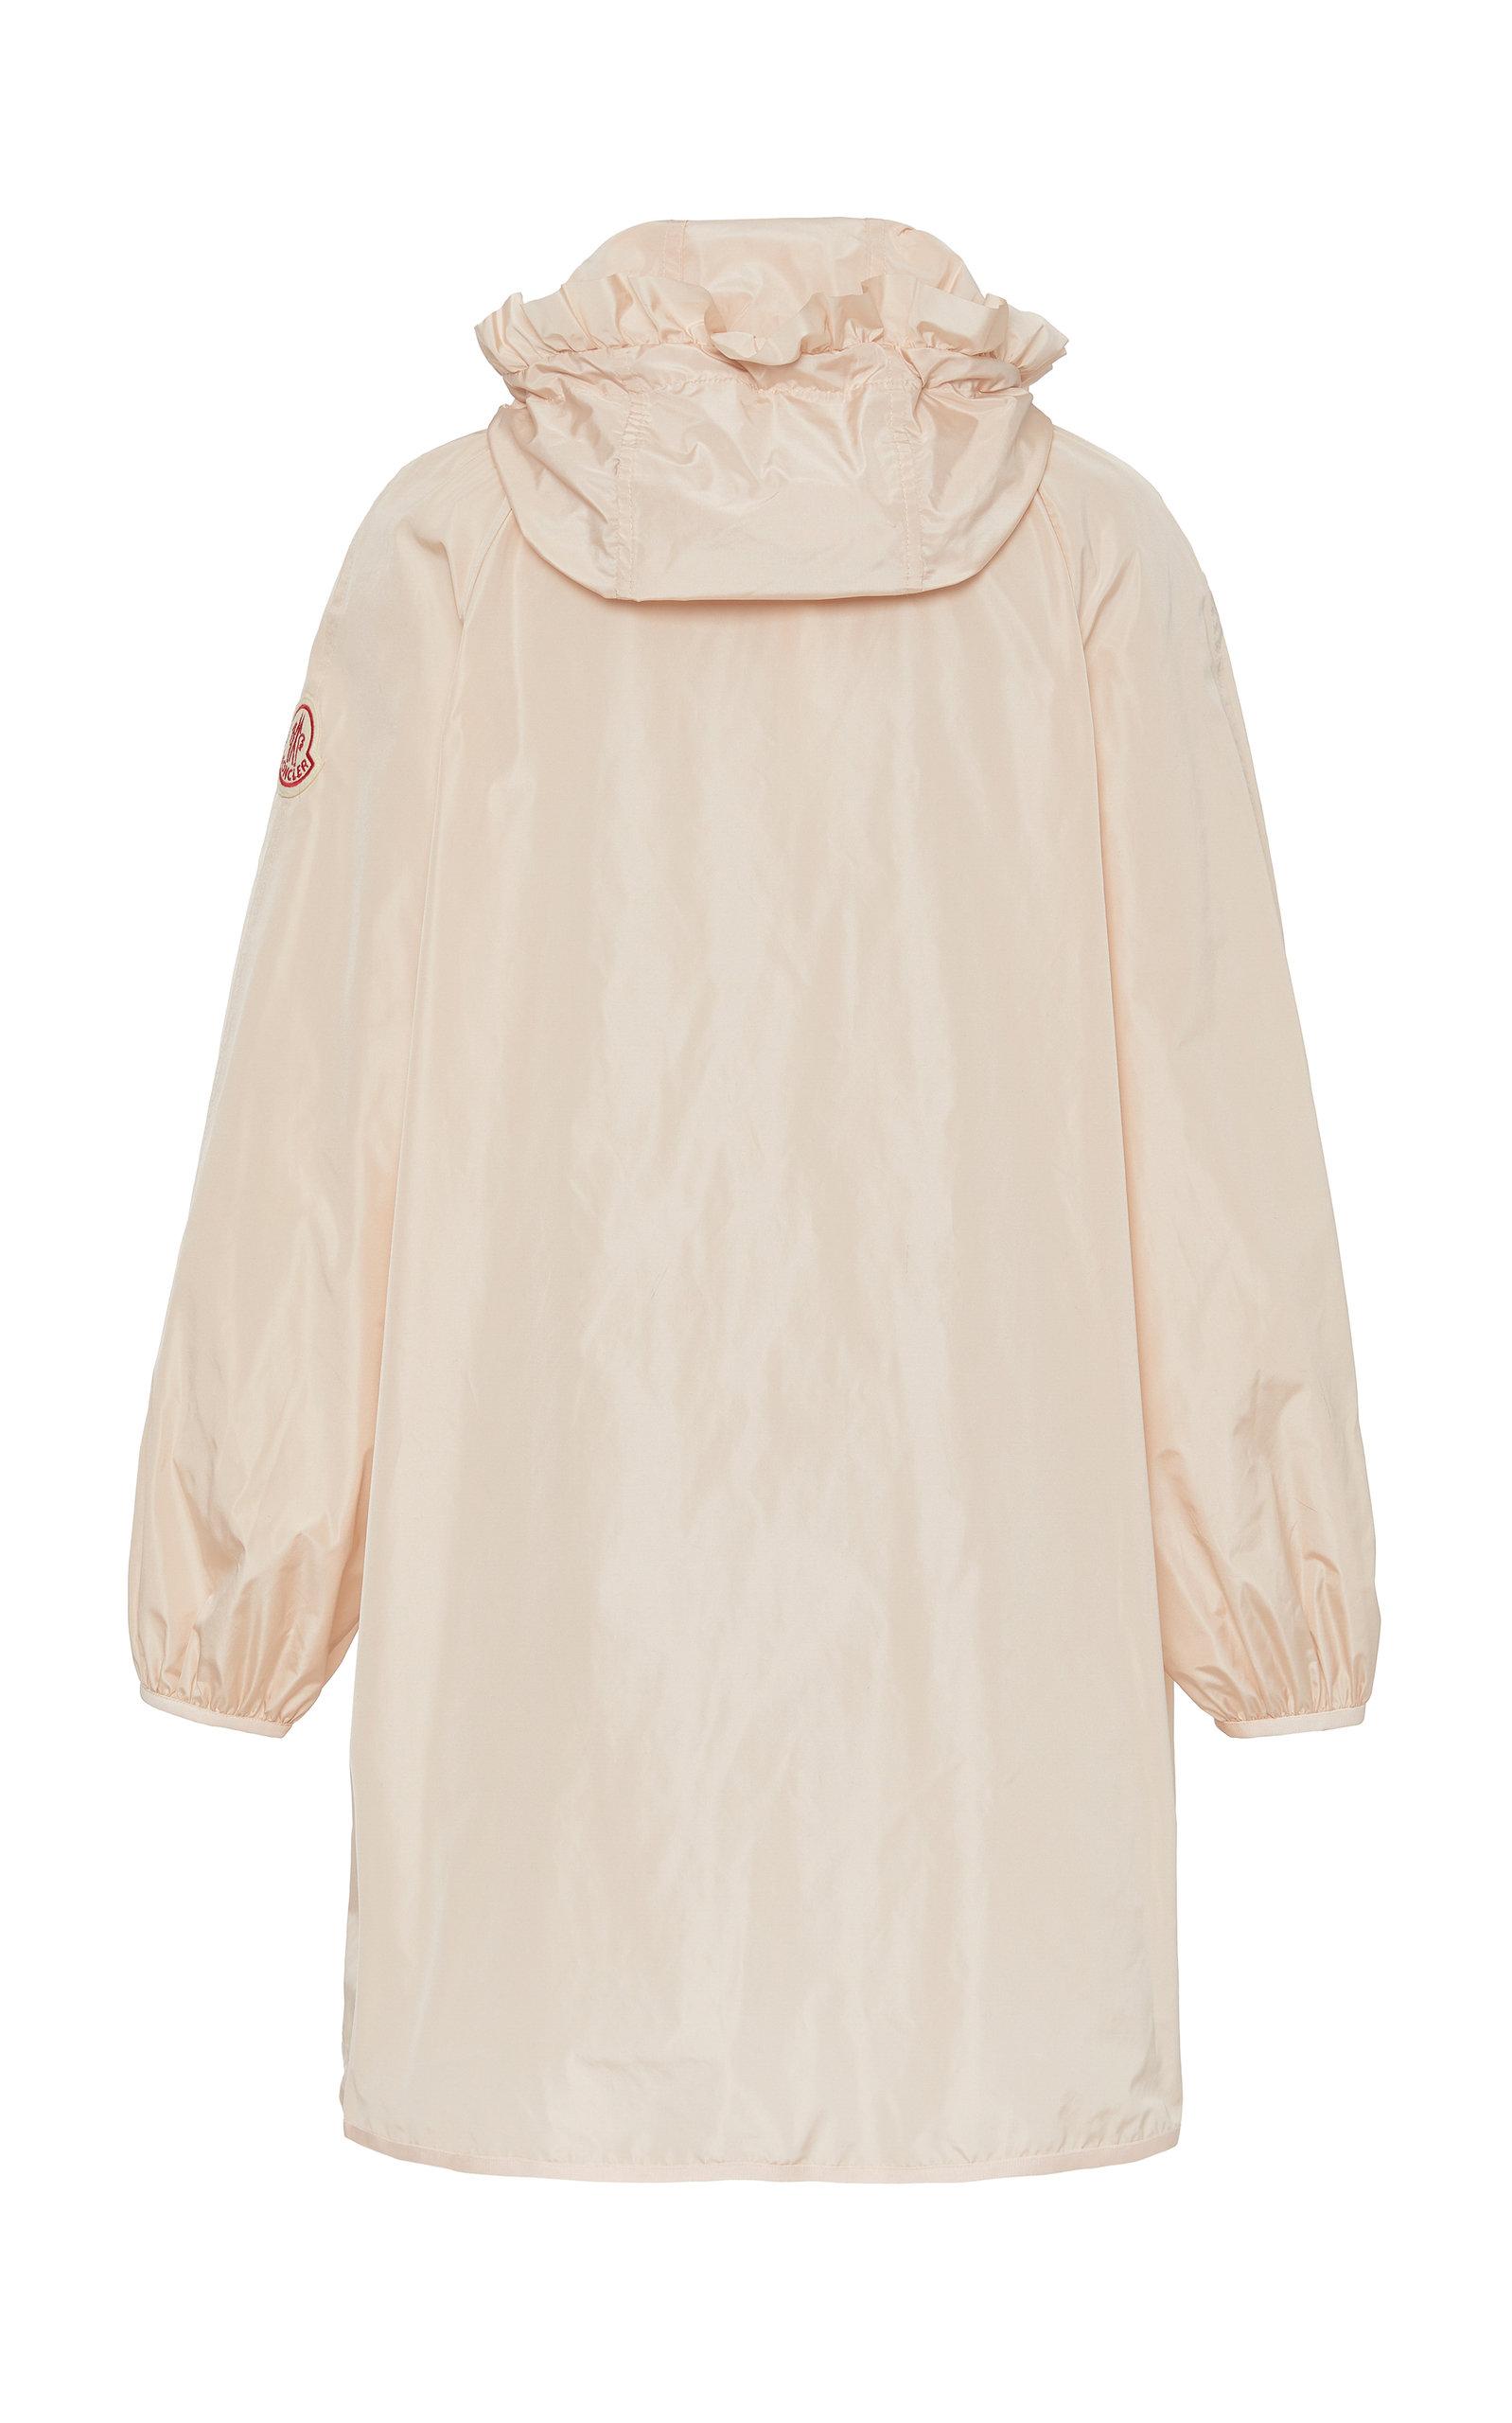 818e32b99d52 Simone Rocha Geranium Ruffled Shell Hooded Coat by Moncler Genius ...